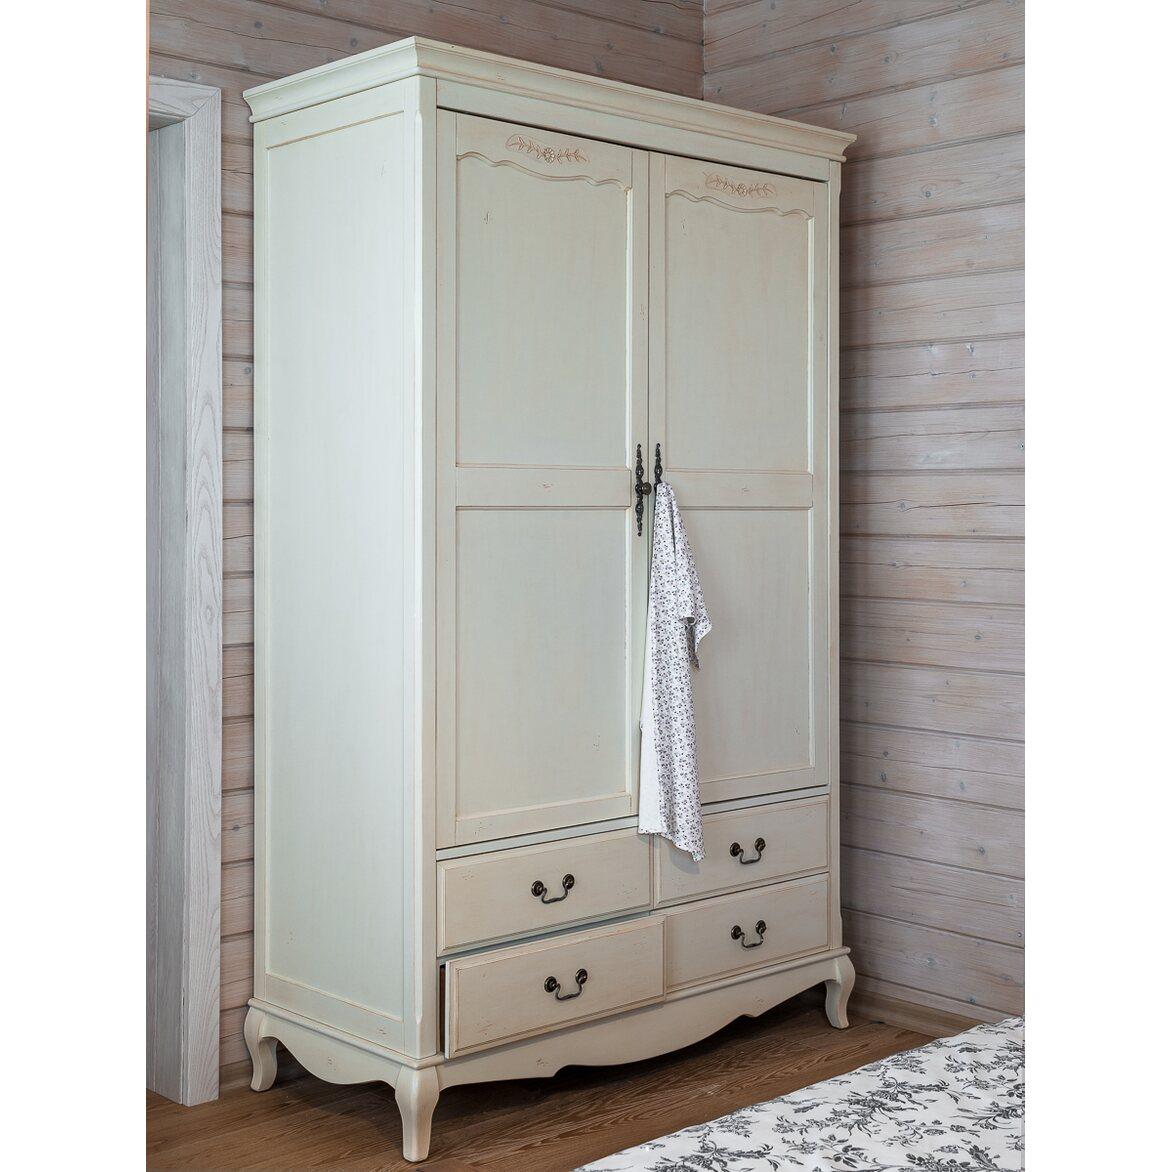 Шкаф двухстворчатый с 4-я ящиками Leontina, бежевого цвета | Платяные шкафы Kingsby